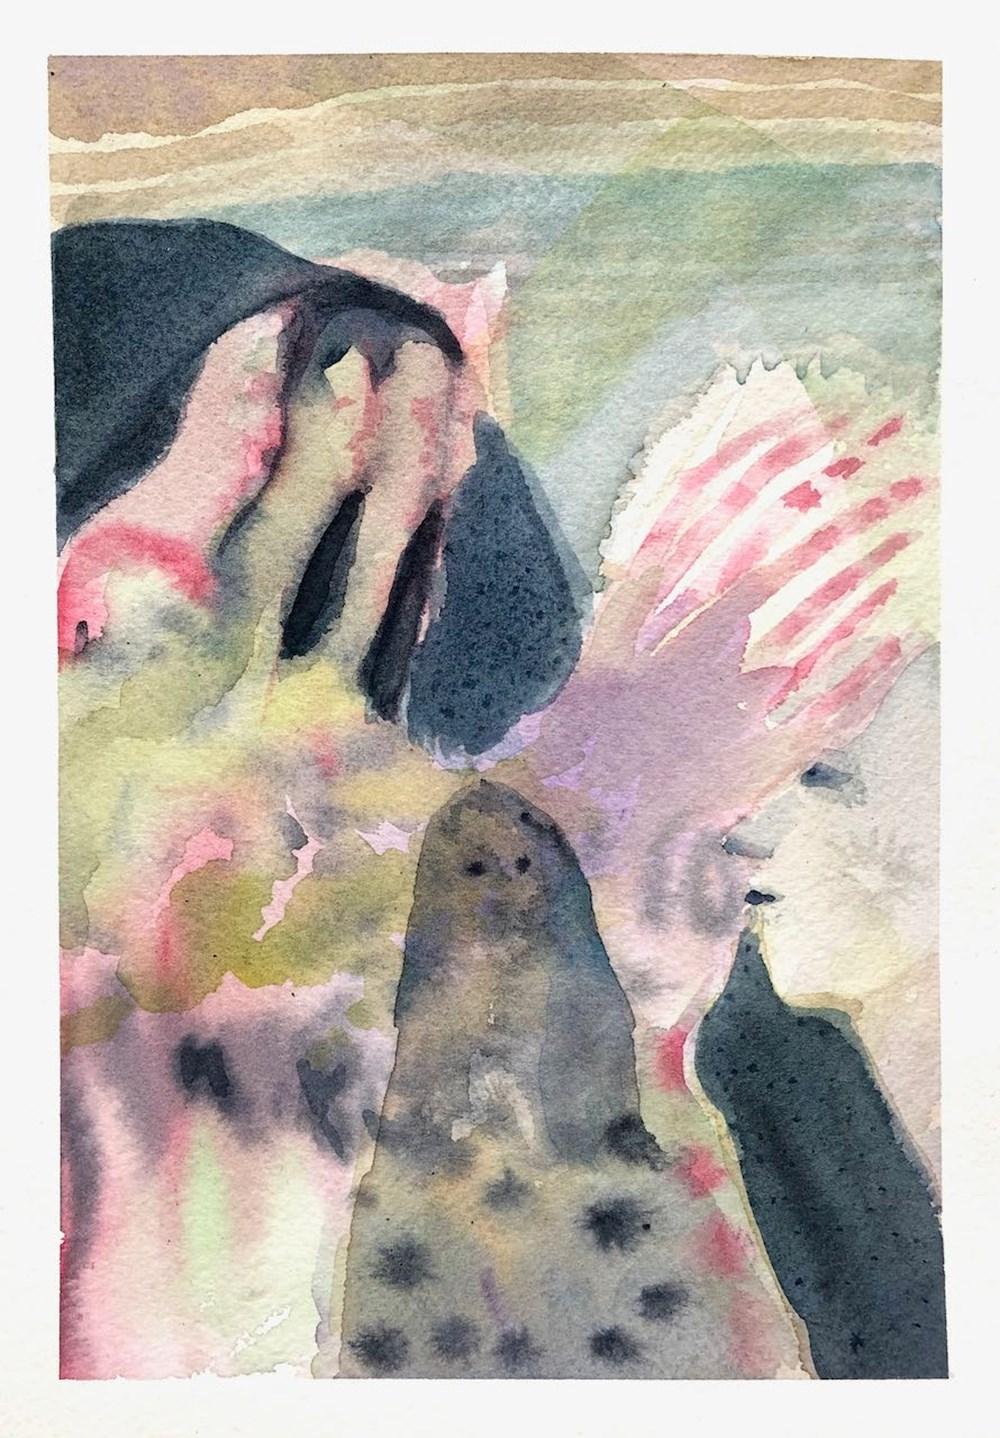 Life on Venus | The Landscape, Live Auction - Lot 20, Simona Orentaite, Healing